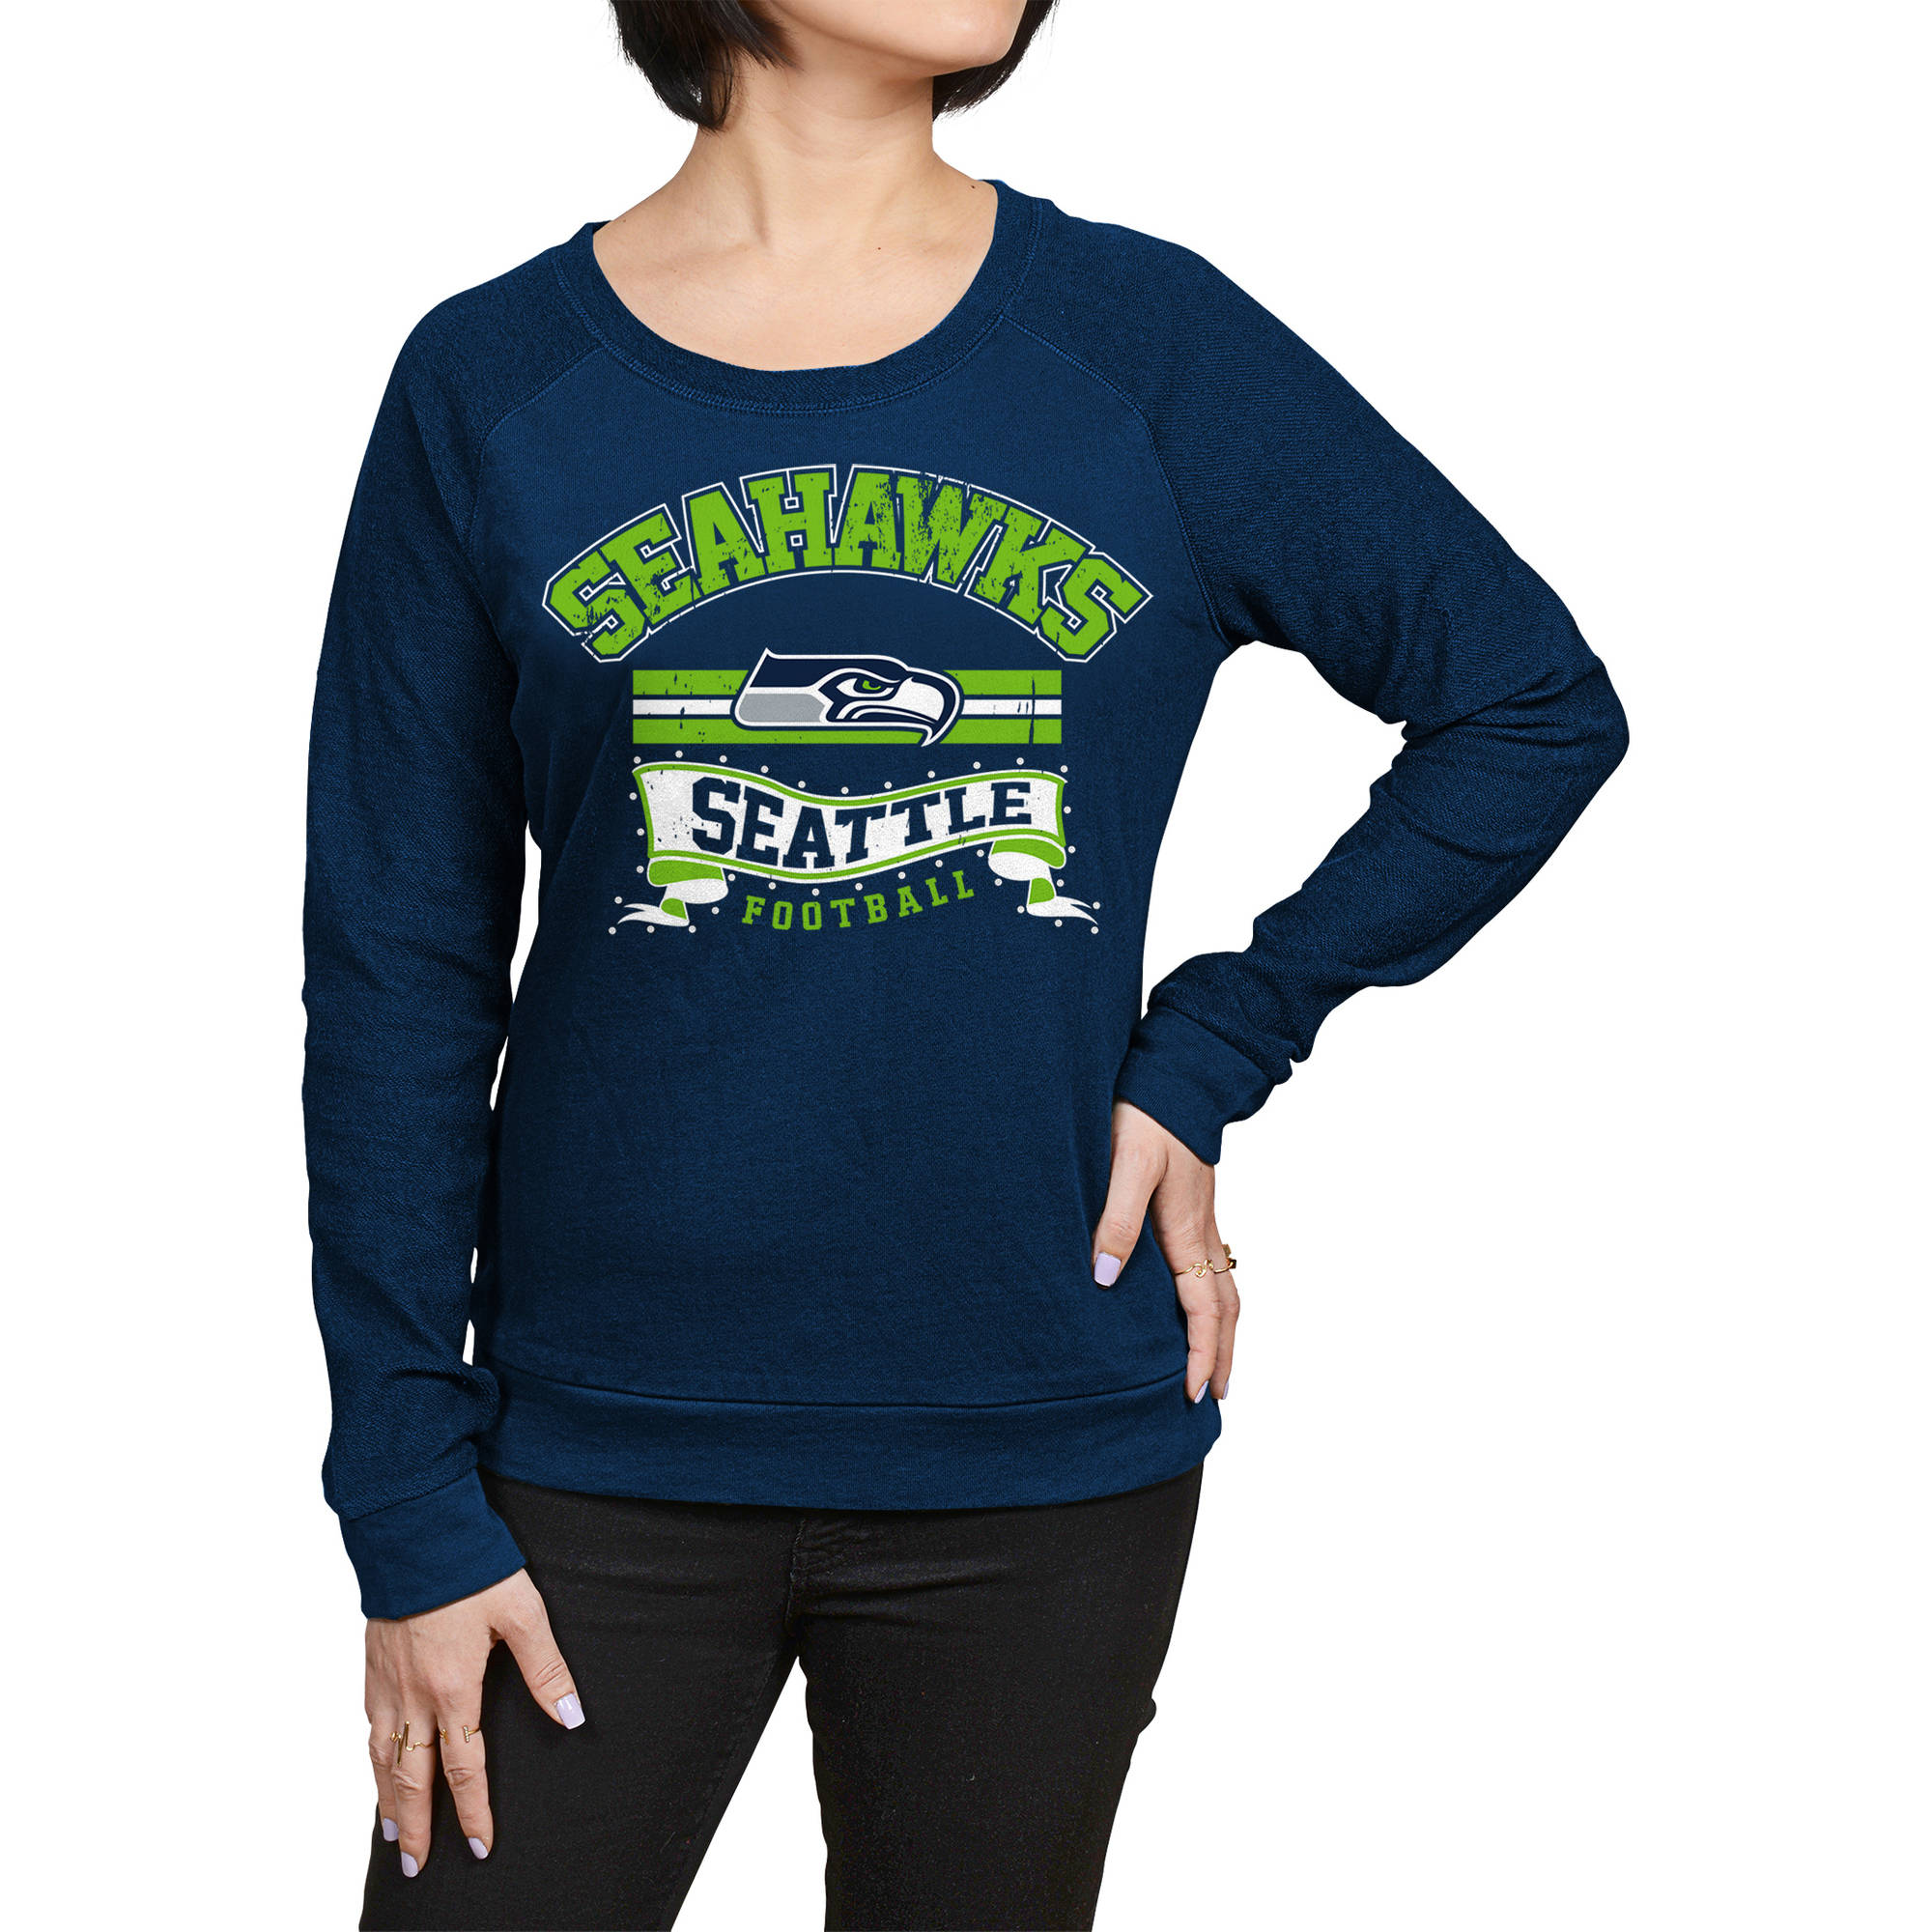 NFL Seattle Seahawks Juniors Fleece Top